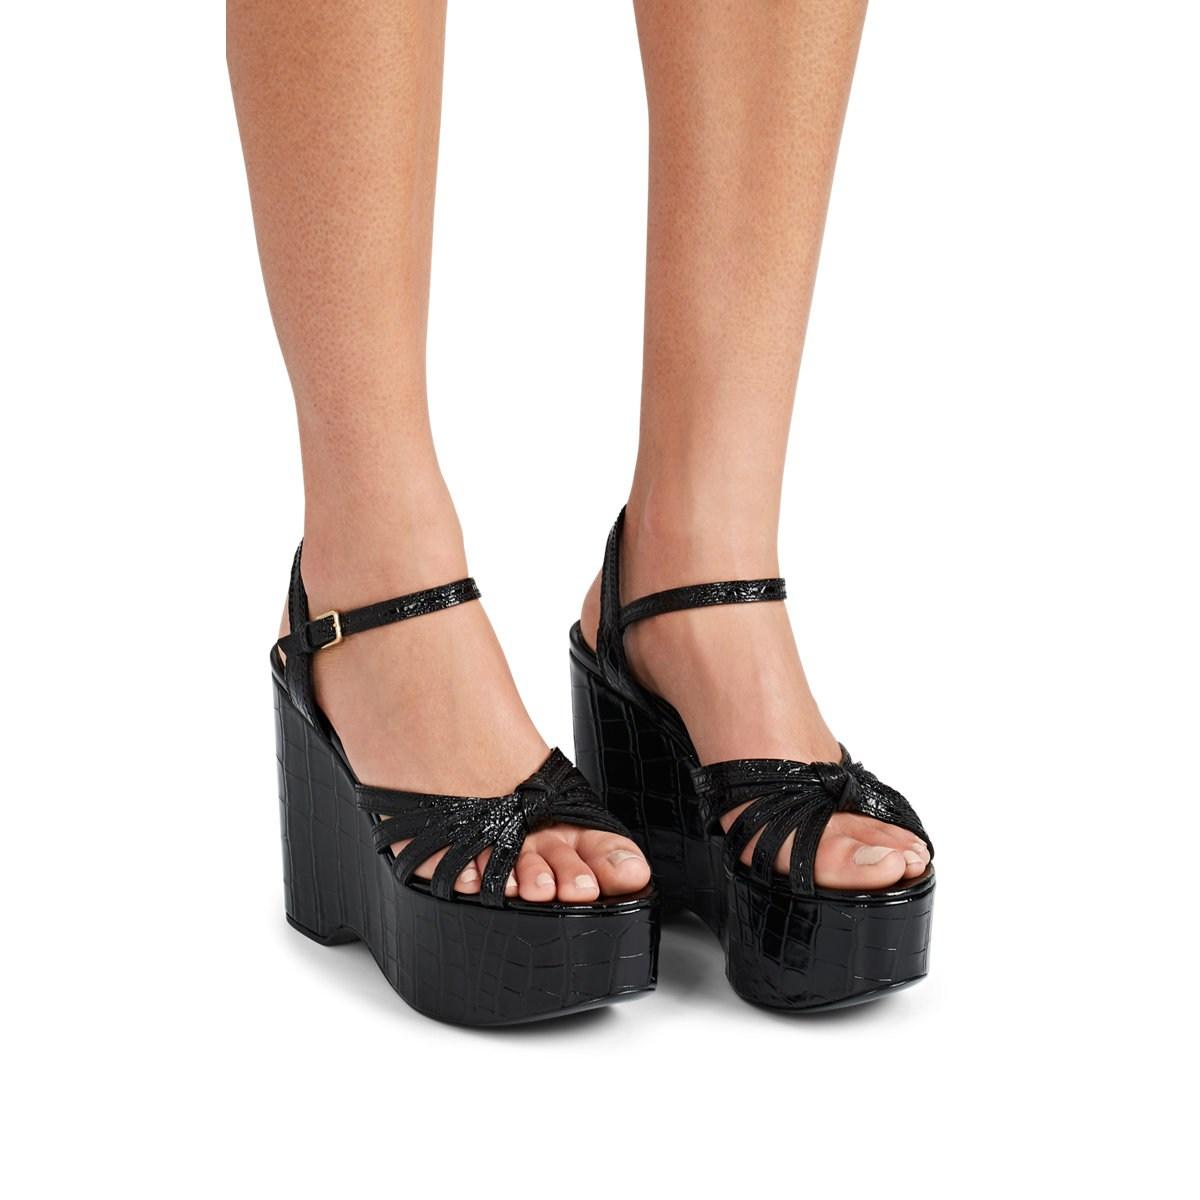 ed510ea1314f Burberry - Black Margate Stamped Leather Platform-wedge Sandals - Lyst.  View fullscreen